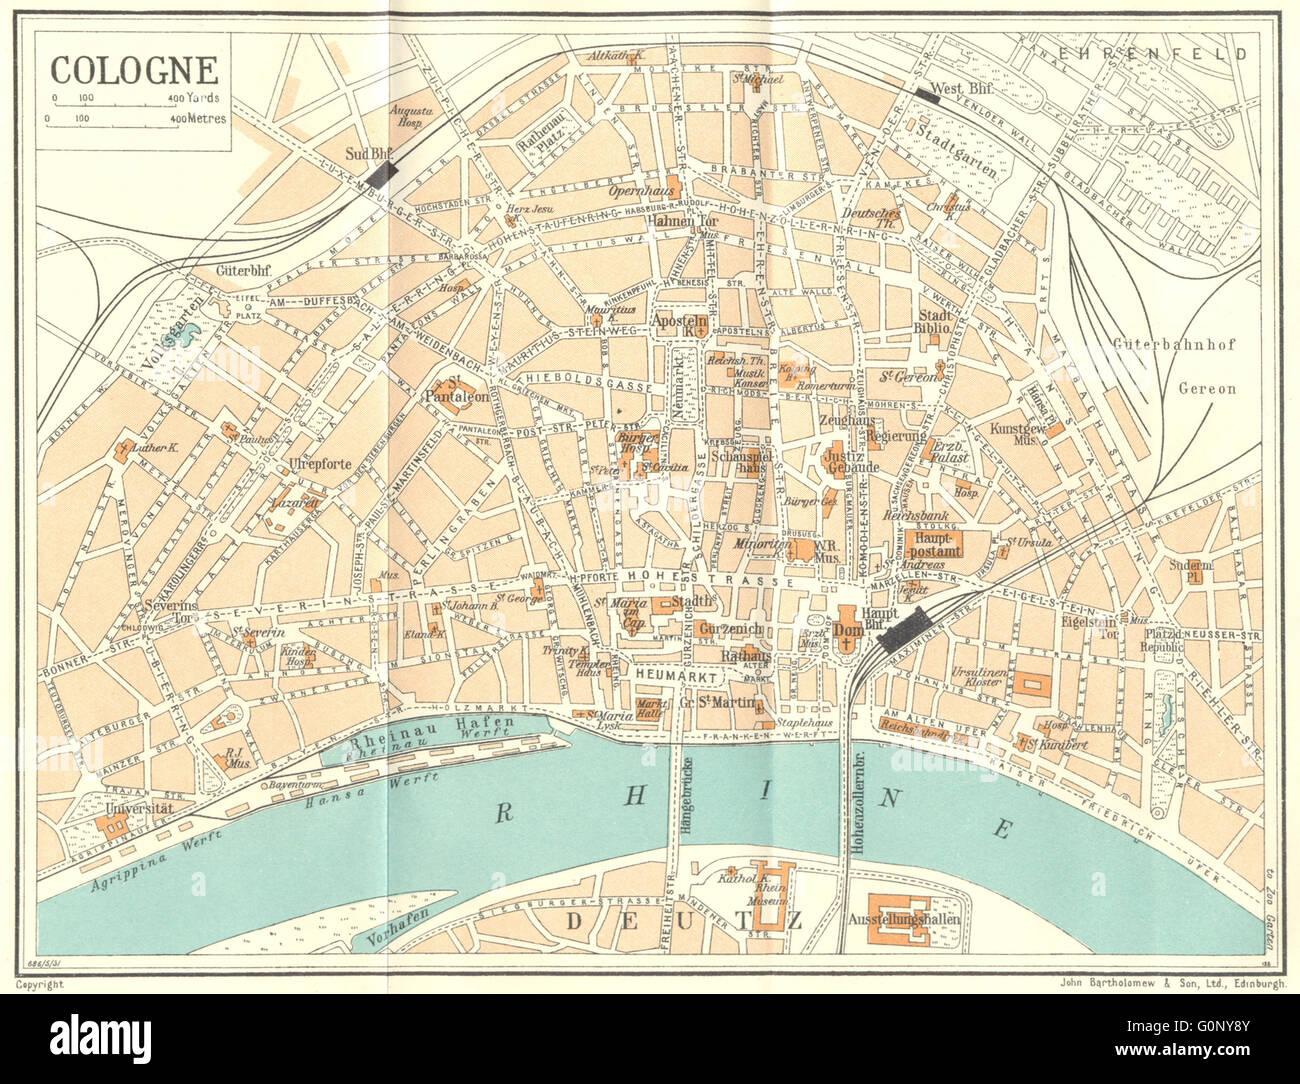 germany cologne 1931 vintage map